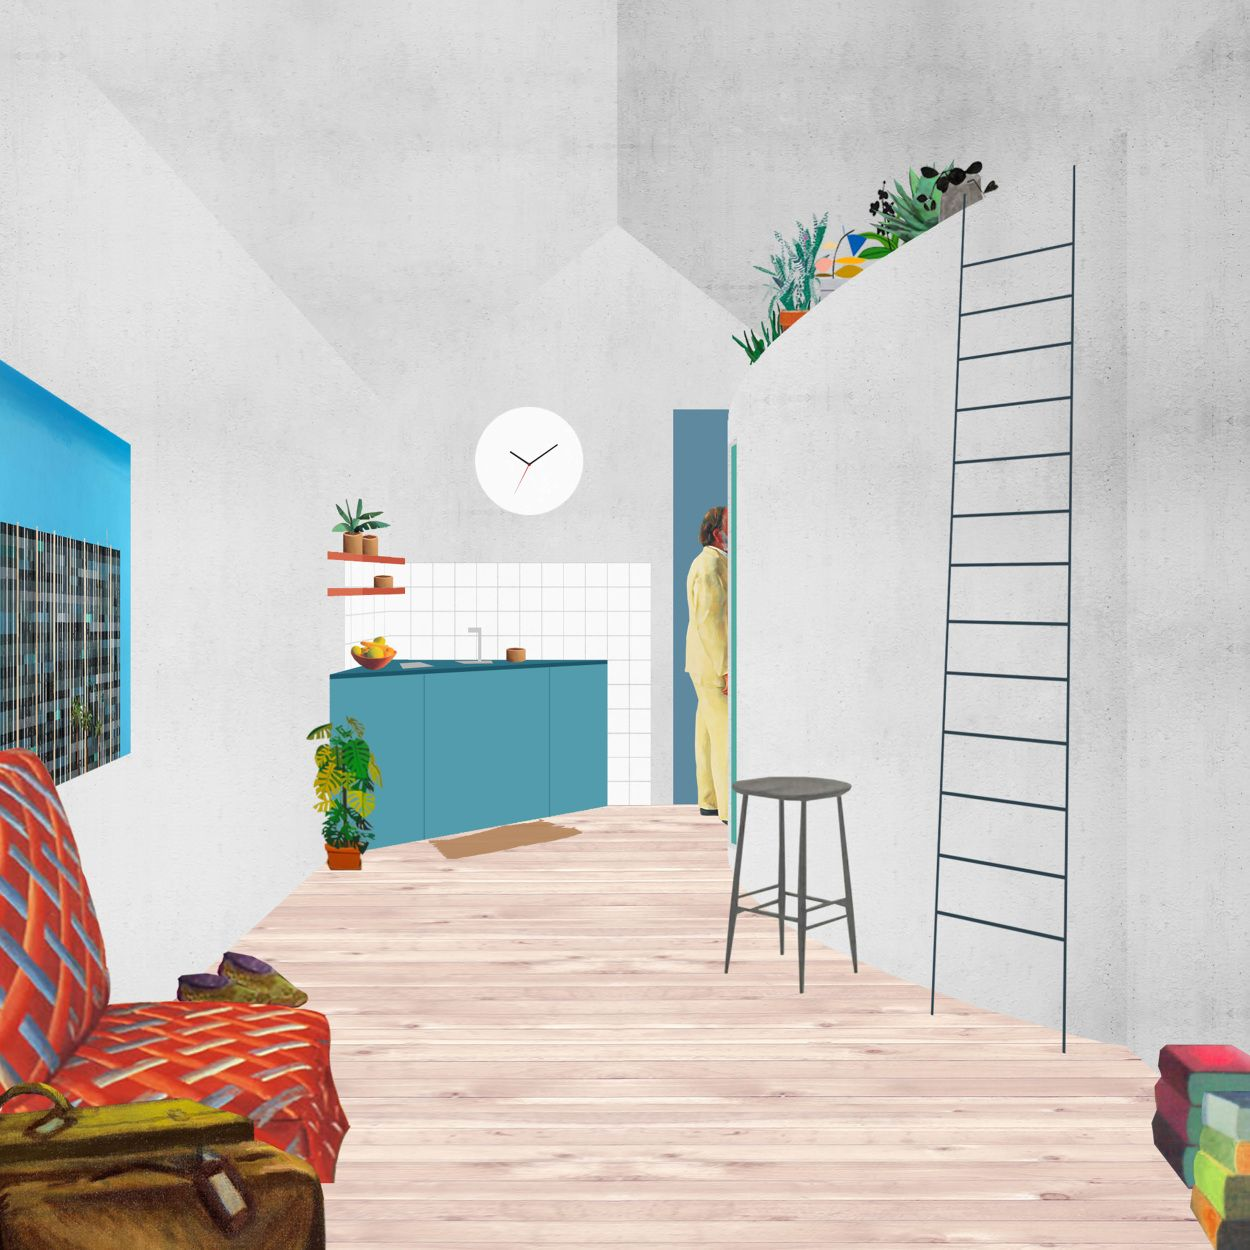 Batalha fala atelier architecture drawing pinterest - Atelier arquitectura ...